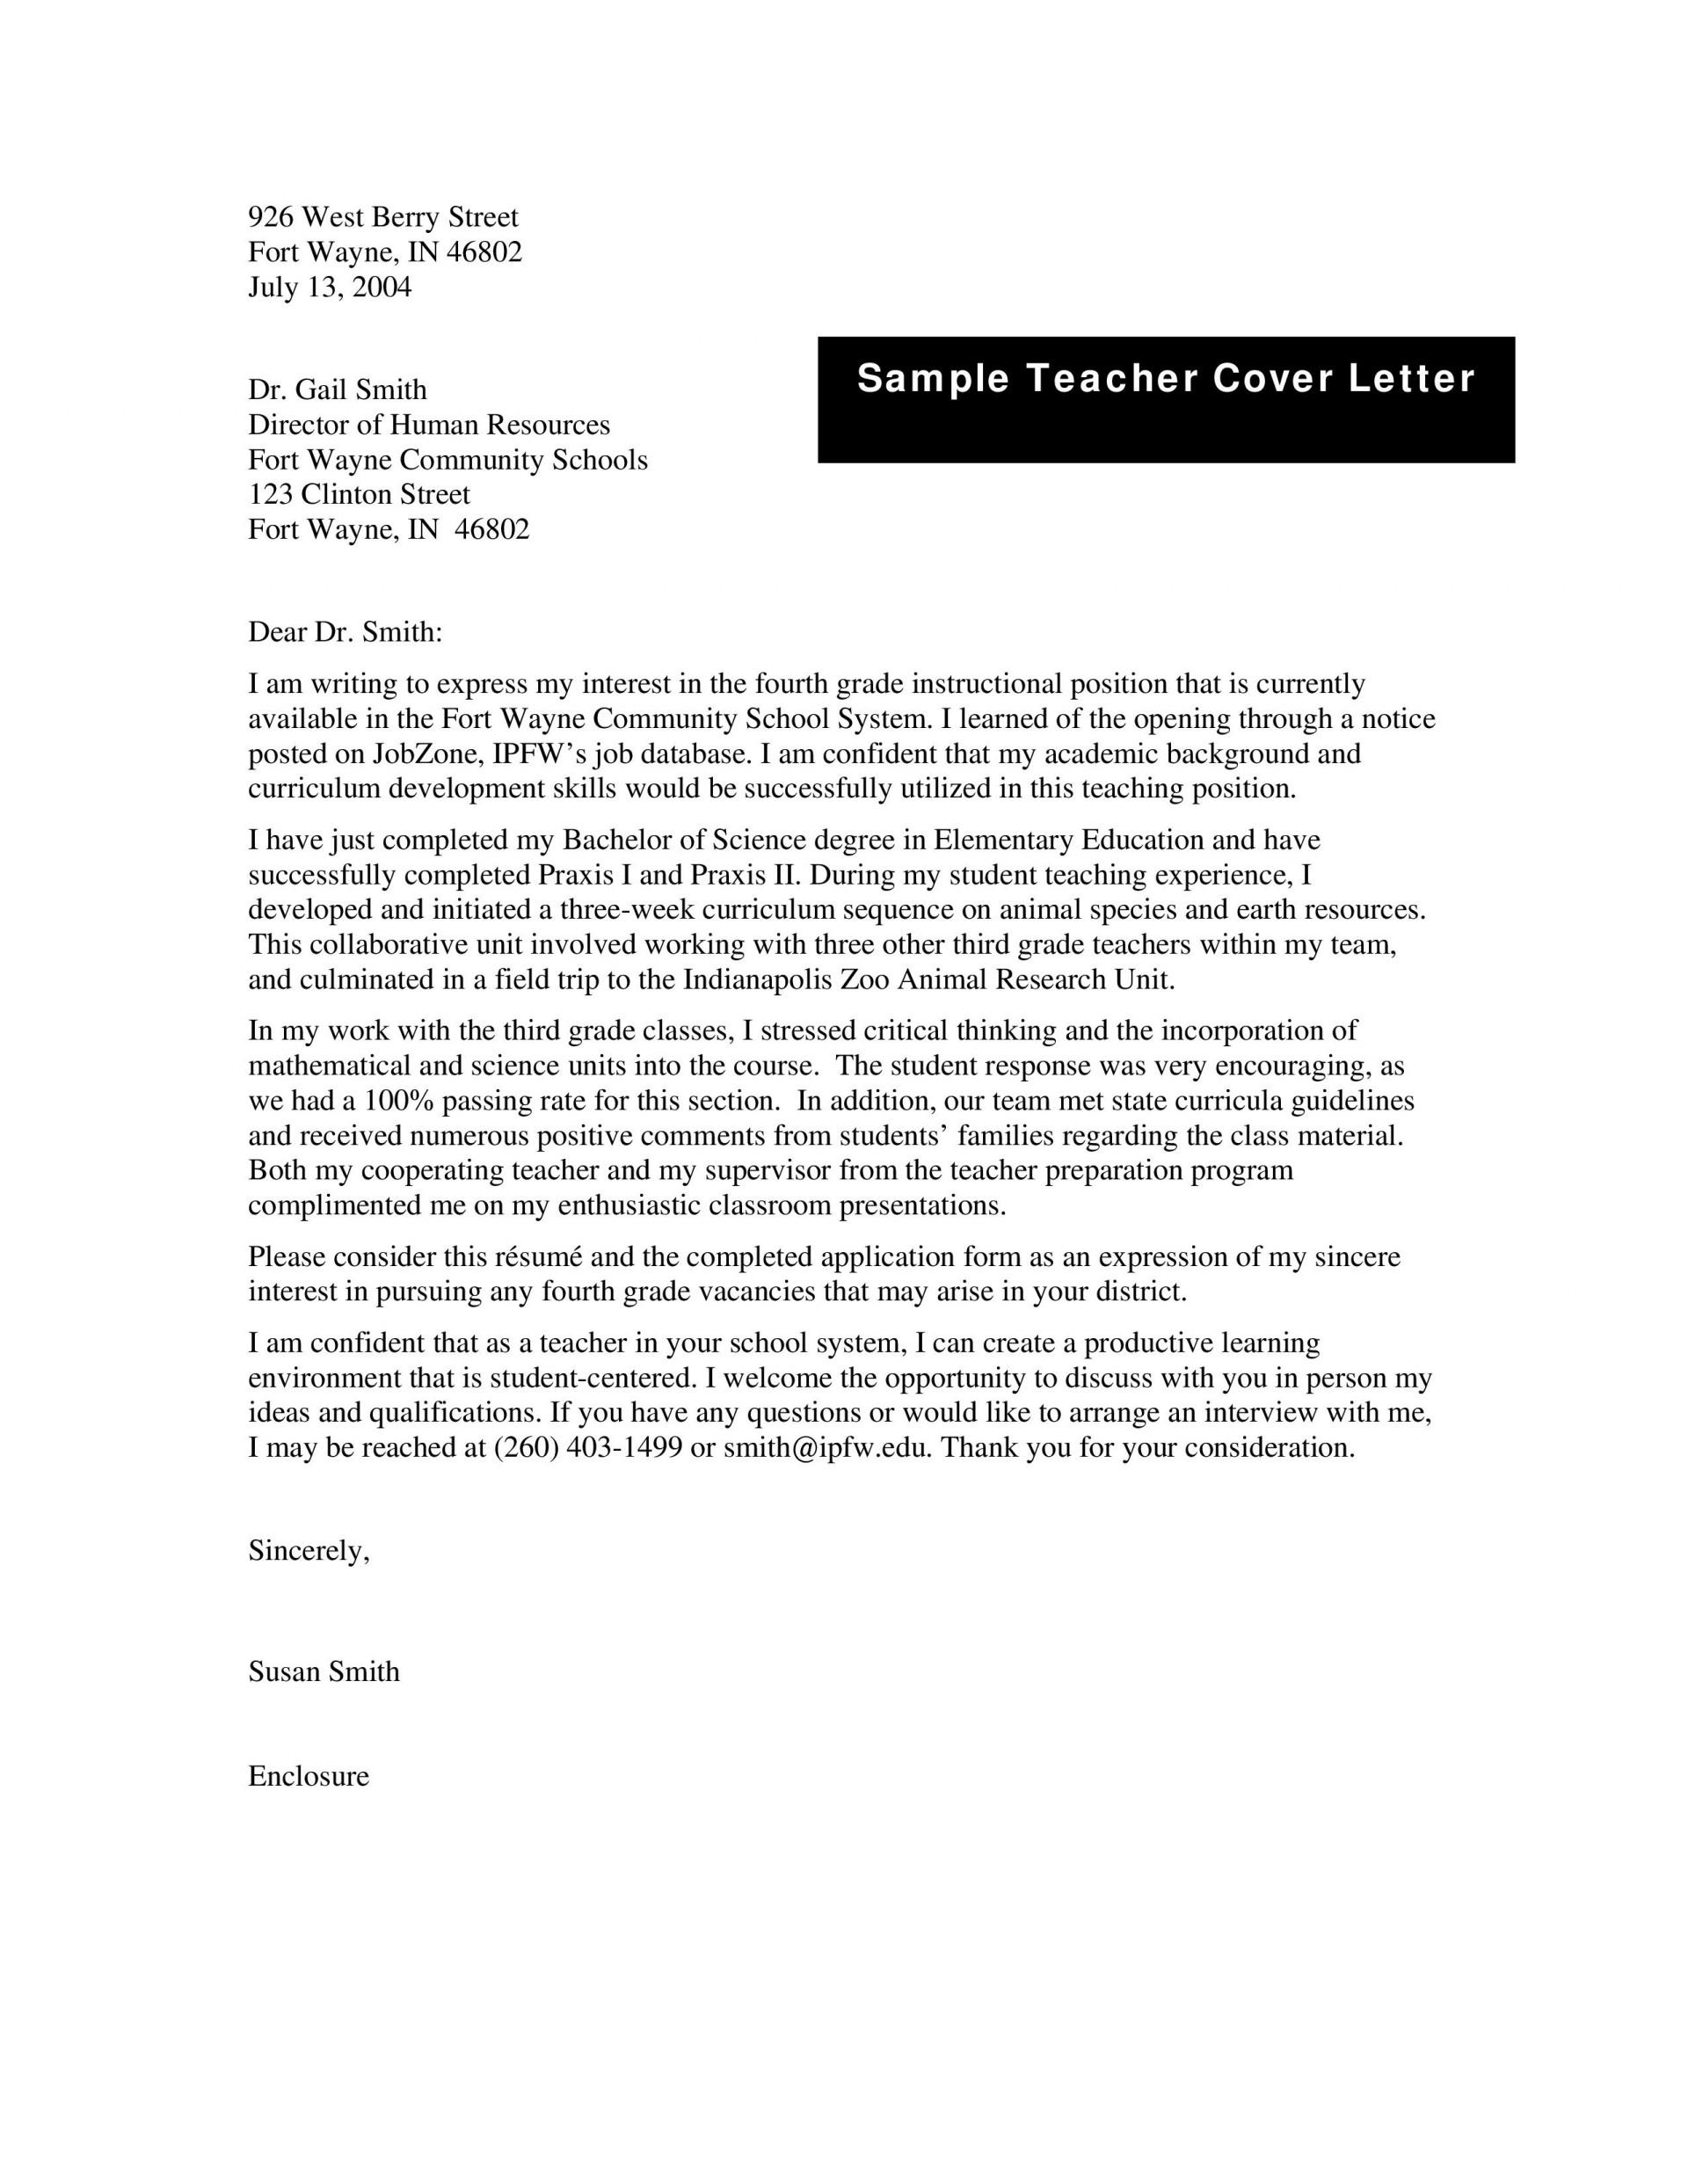 001 Simple Teacher Cover Letter Template High Def  Teaching Job1920